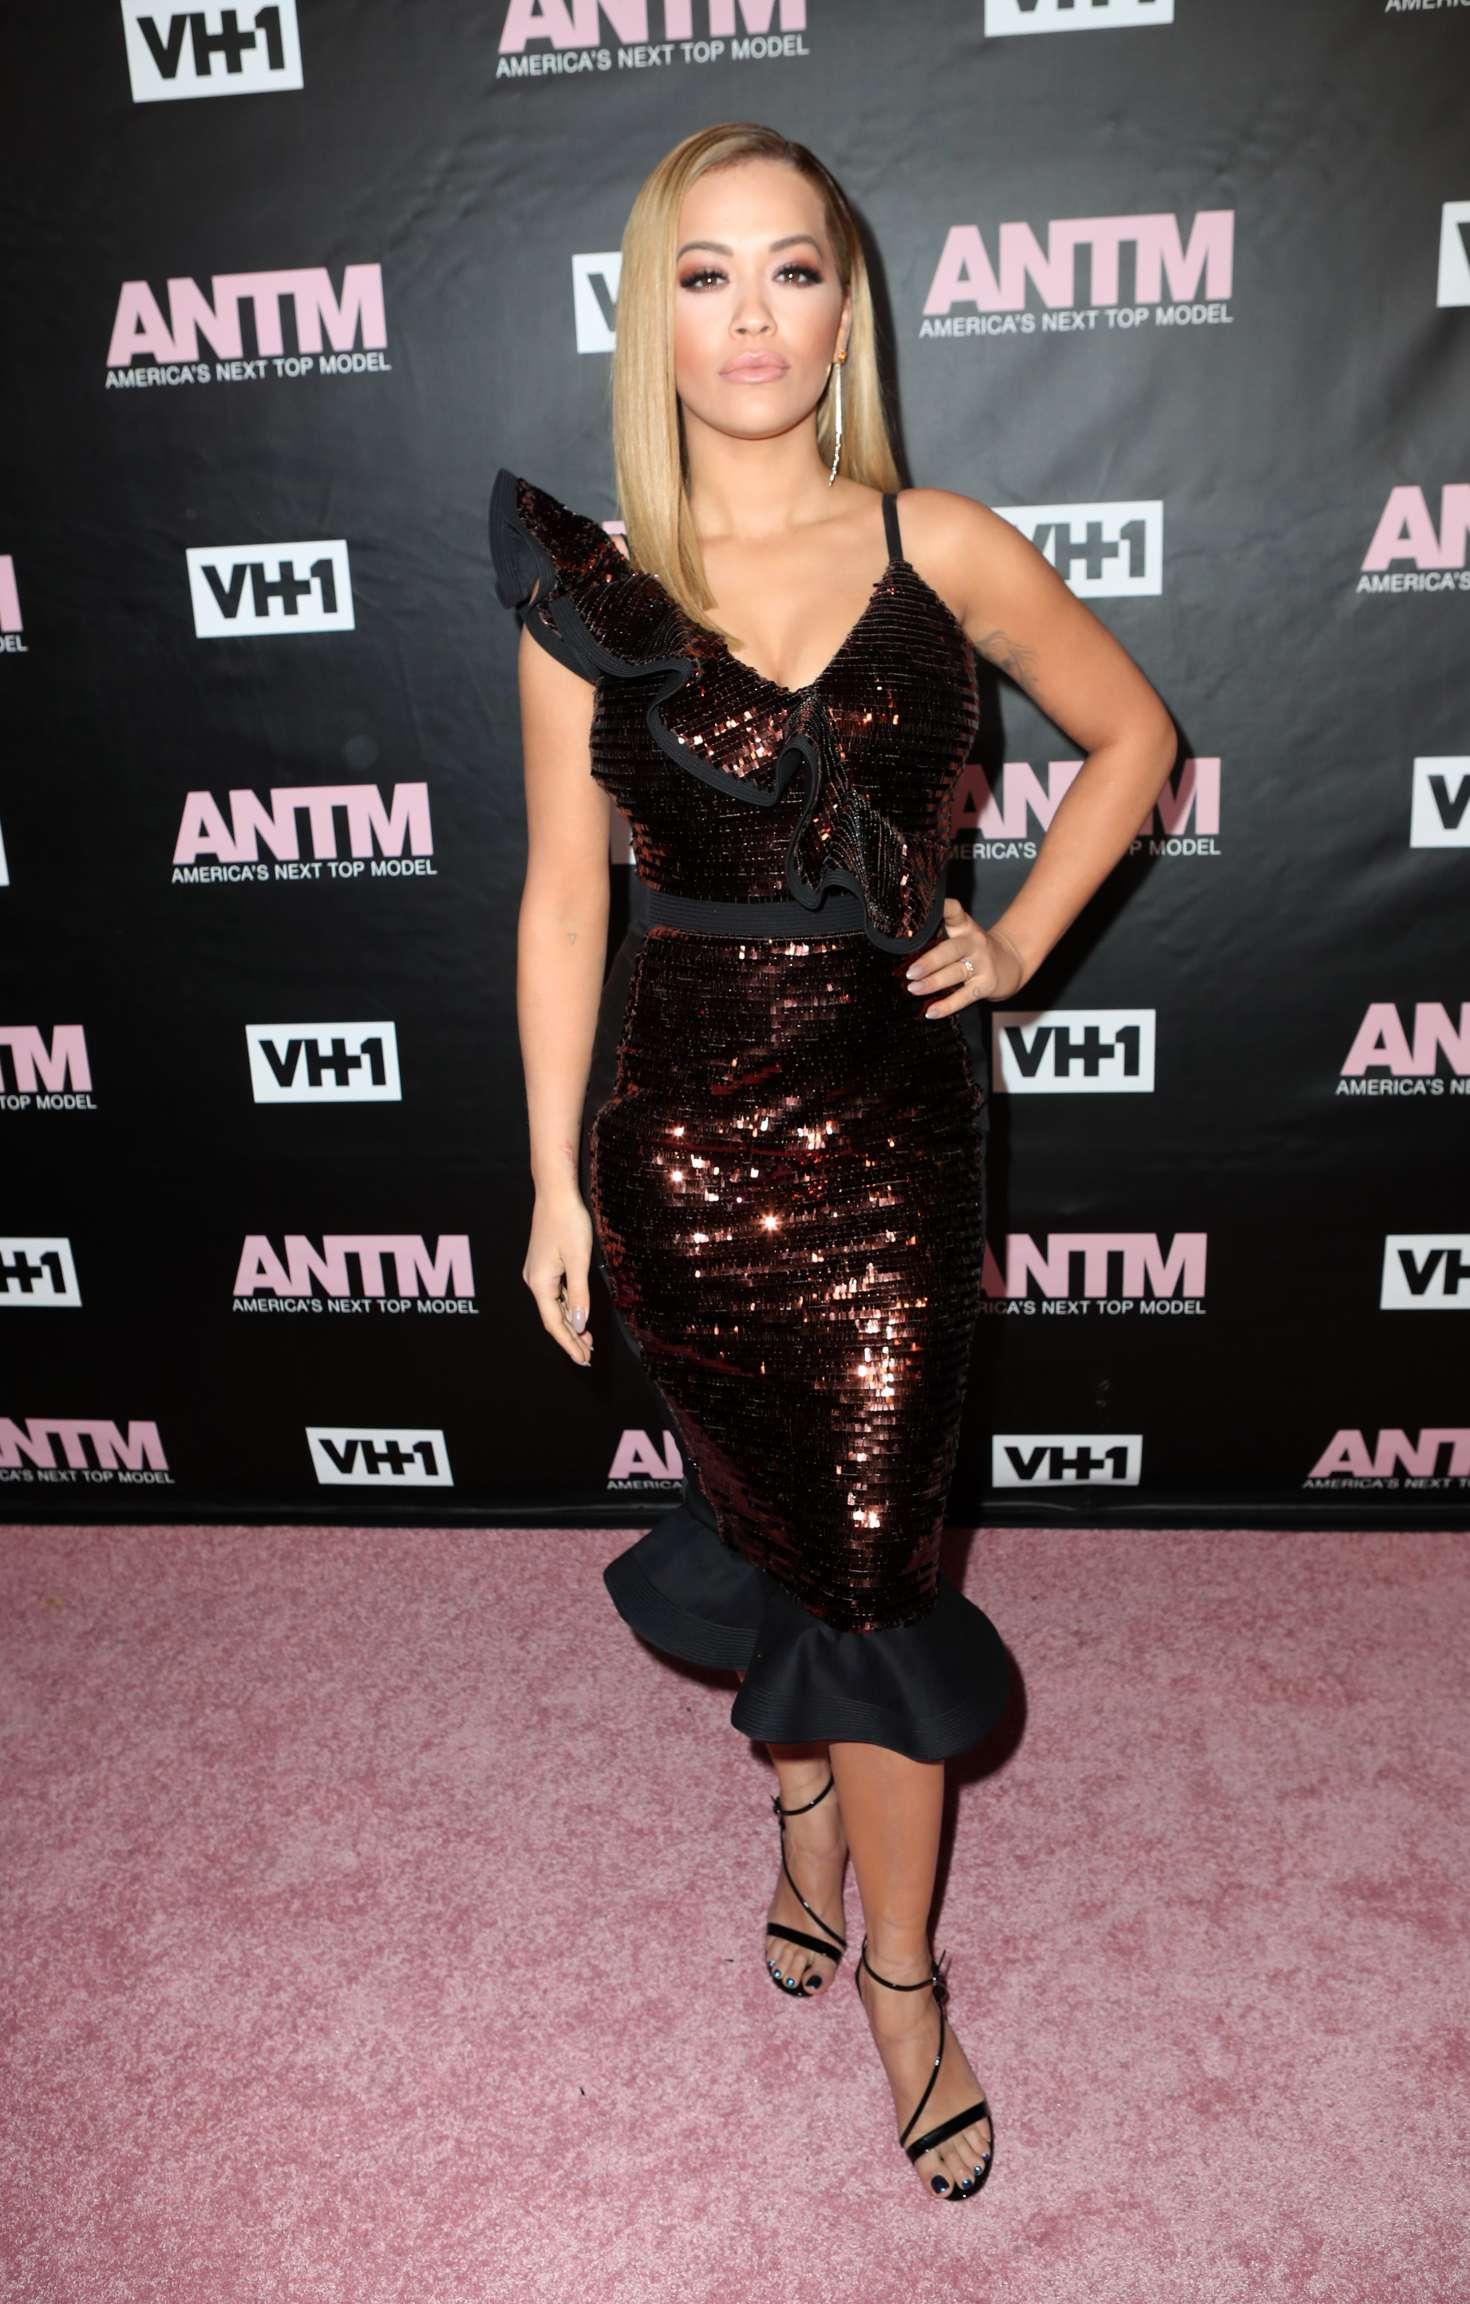 Rita Ora 2016 : Rita Ora: Americas Next Top Model Premiere Party -13